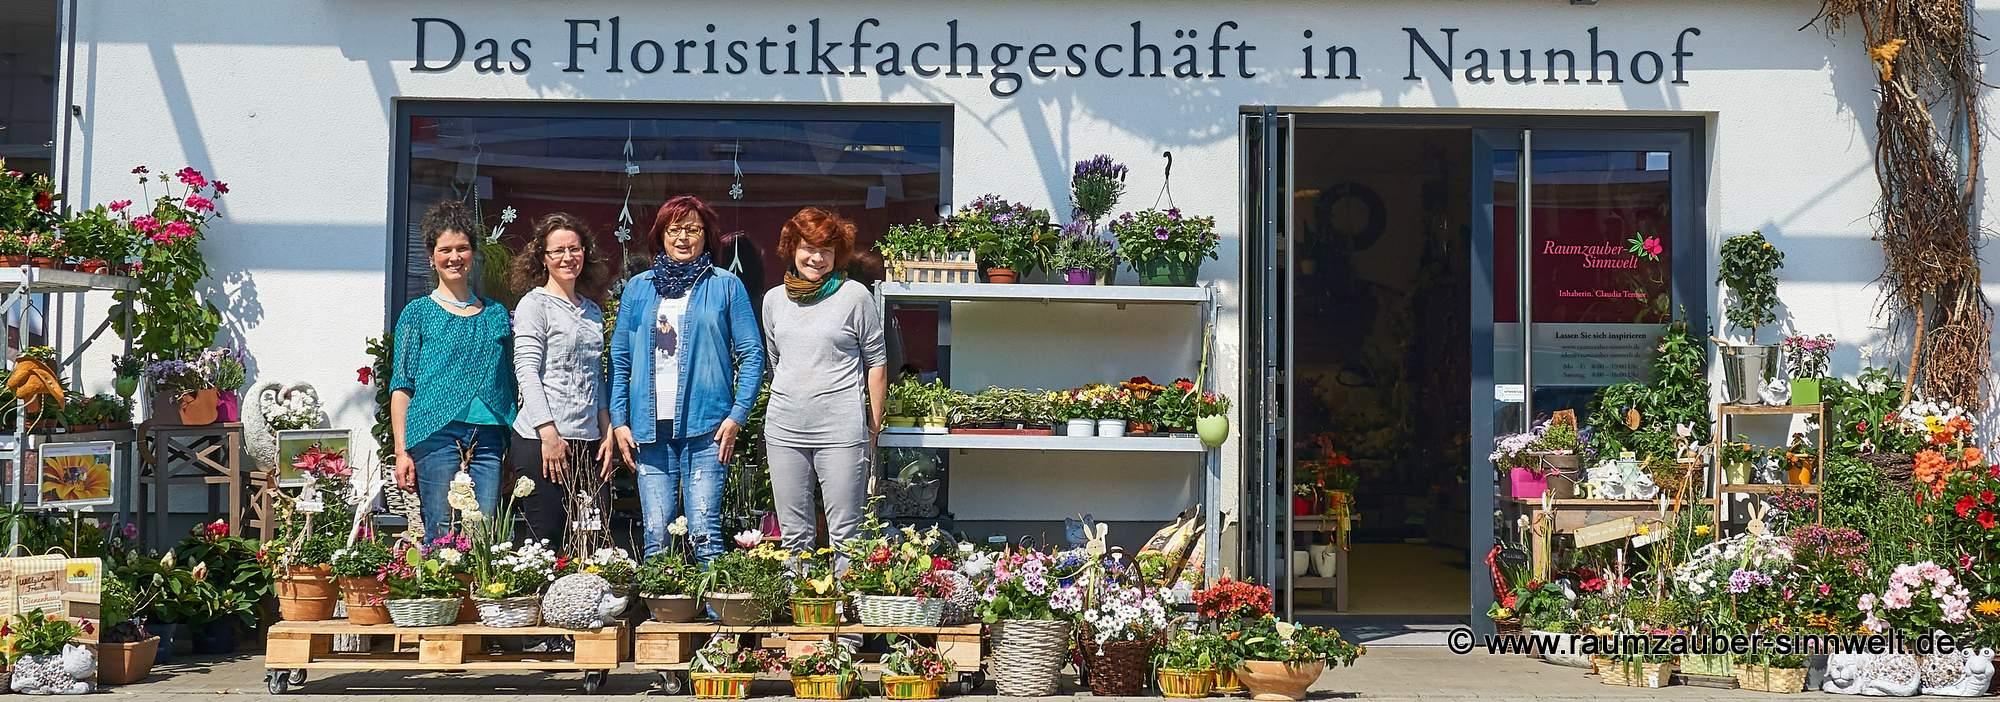 © www.raumzauber-sinnwelt.de menu